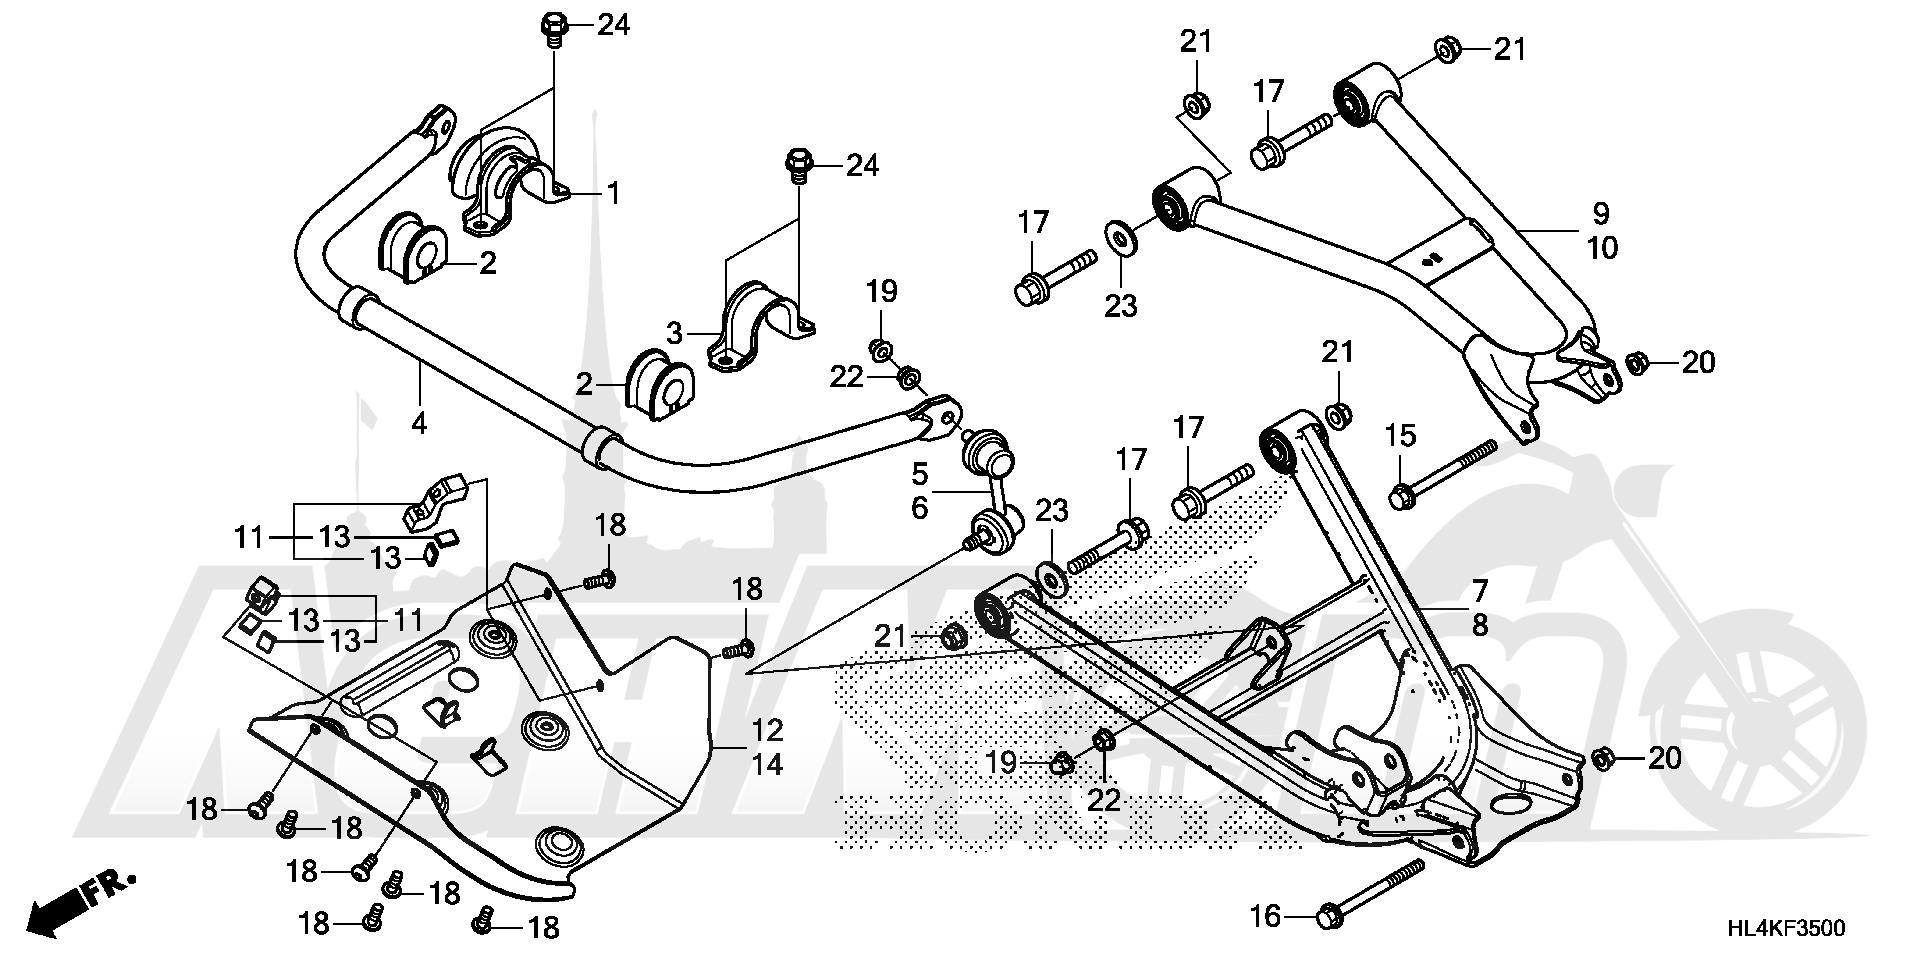 Запчасти для Квадроцикла Honda 2019 SXS1000M5L Раздел: REAR ARM AND REAR STABILIZER | задний рычаг и зад стабилизатор